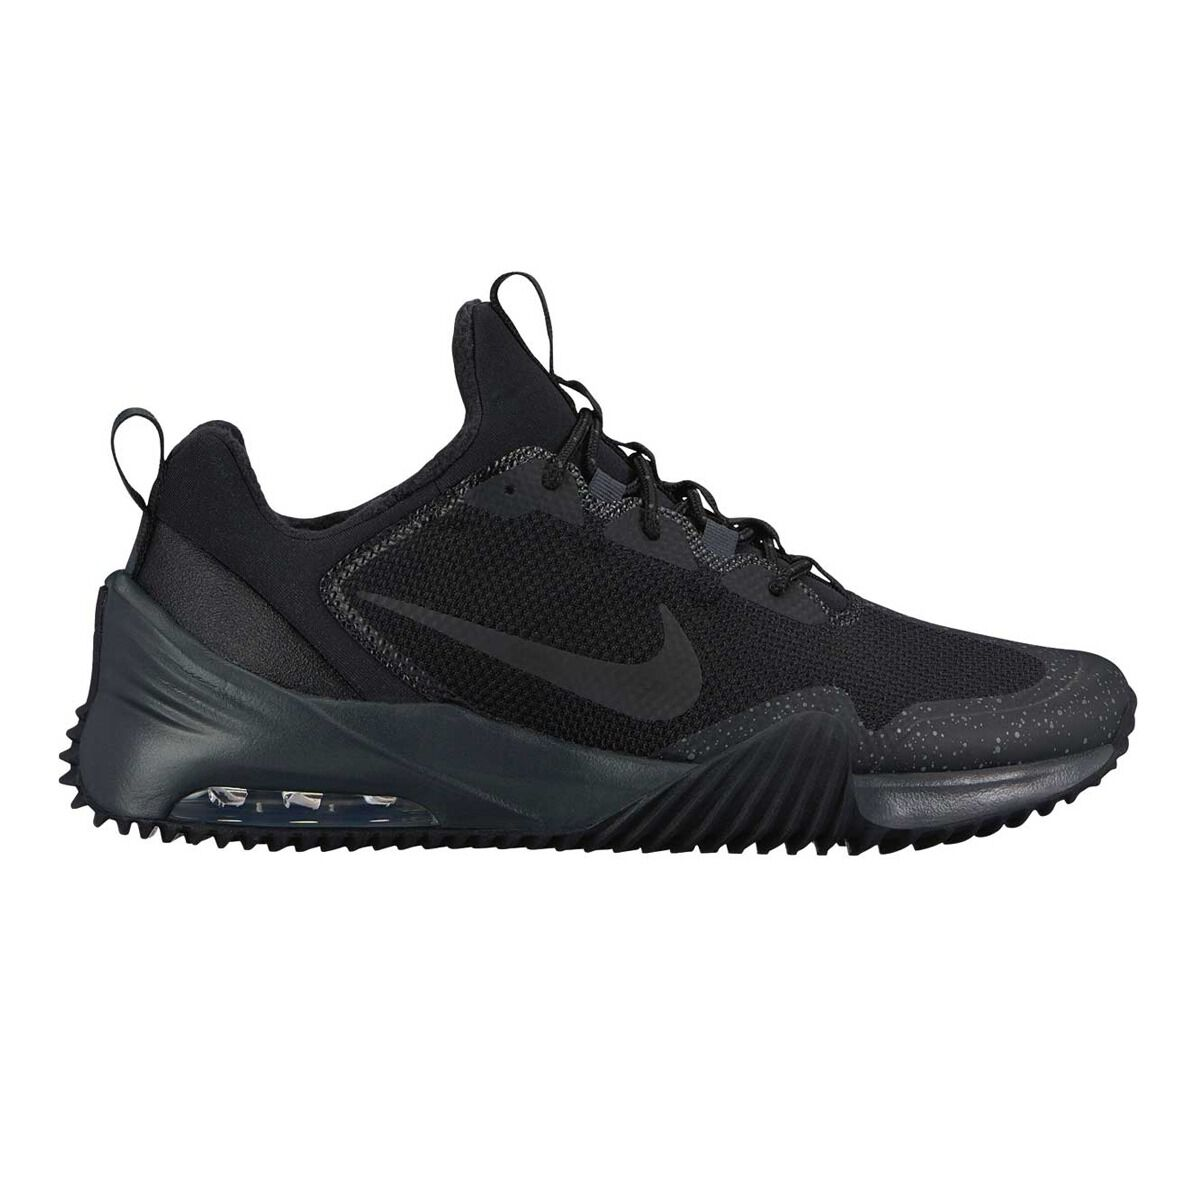 Nike Air Max Grigora Mens Casual Shoes Black US 12, Black, rebel_hi-res